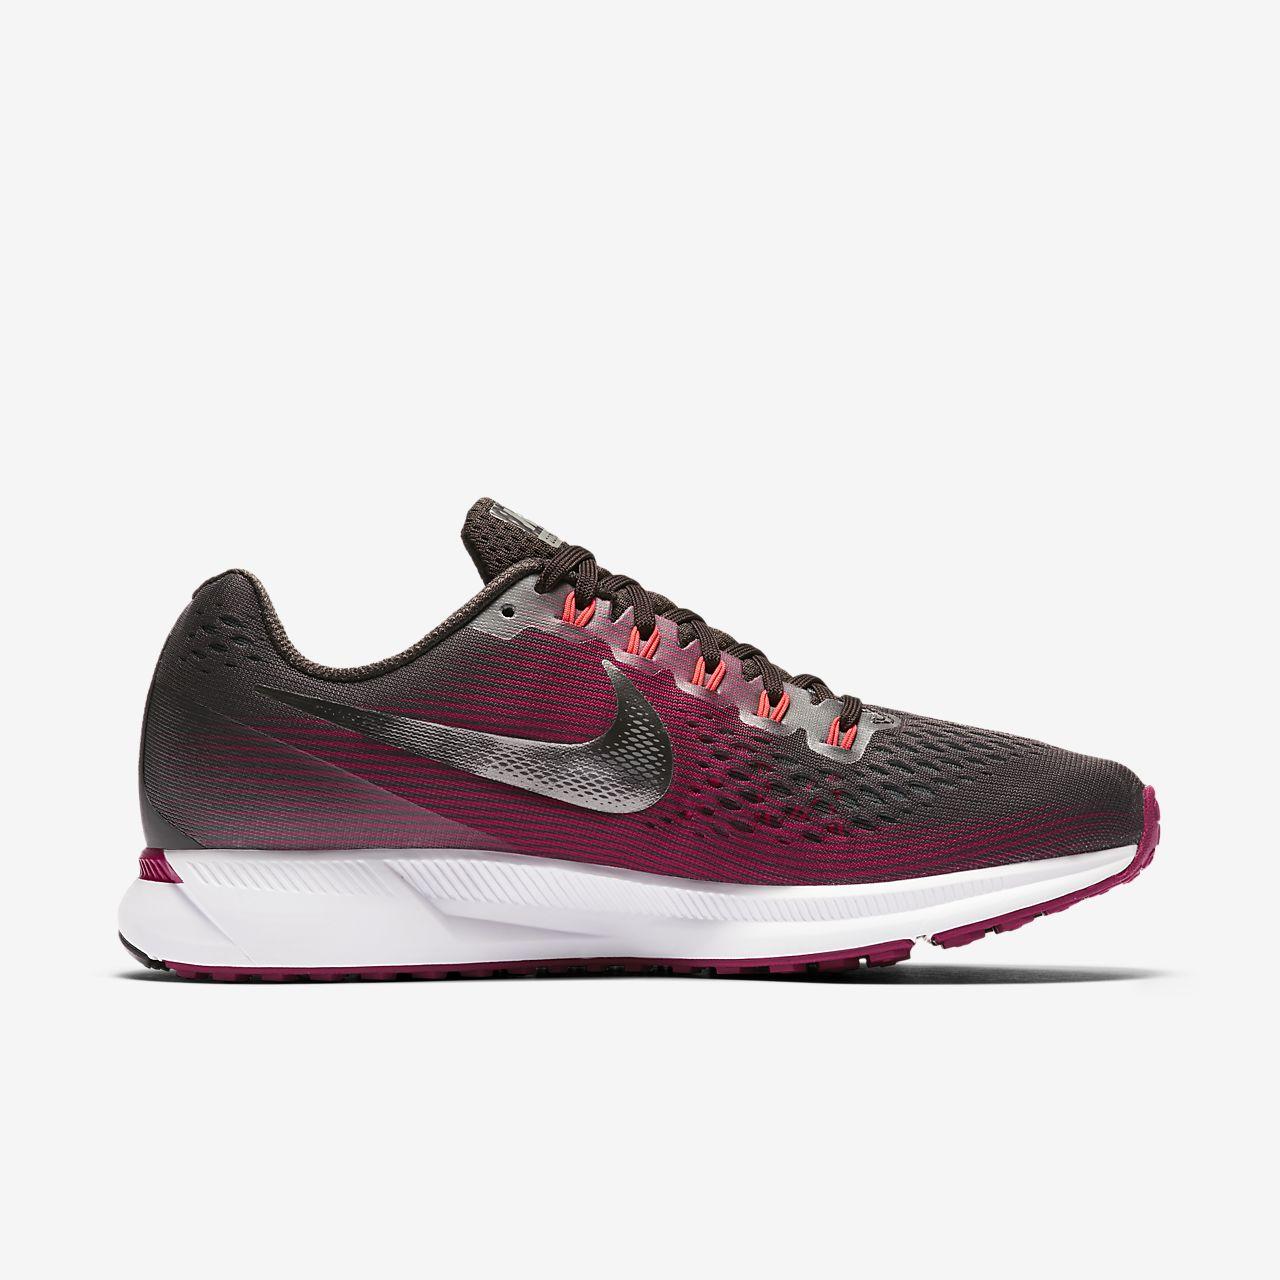 ignorancia Equipo de juegos Calumnia  Nike Air Zoom Pegasus 34 Gem 女子跑步鞋-耐克(Nike)中国官网